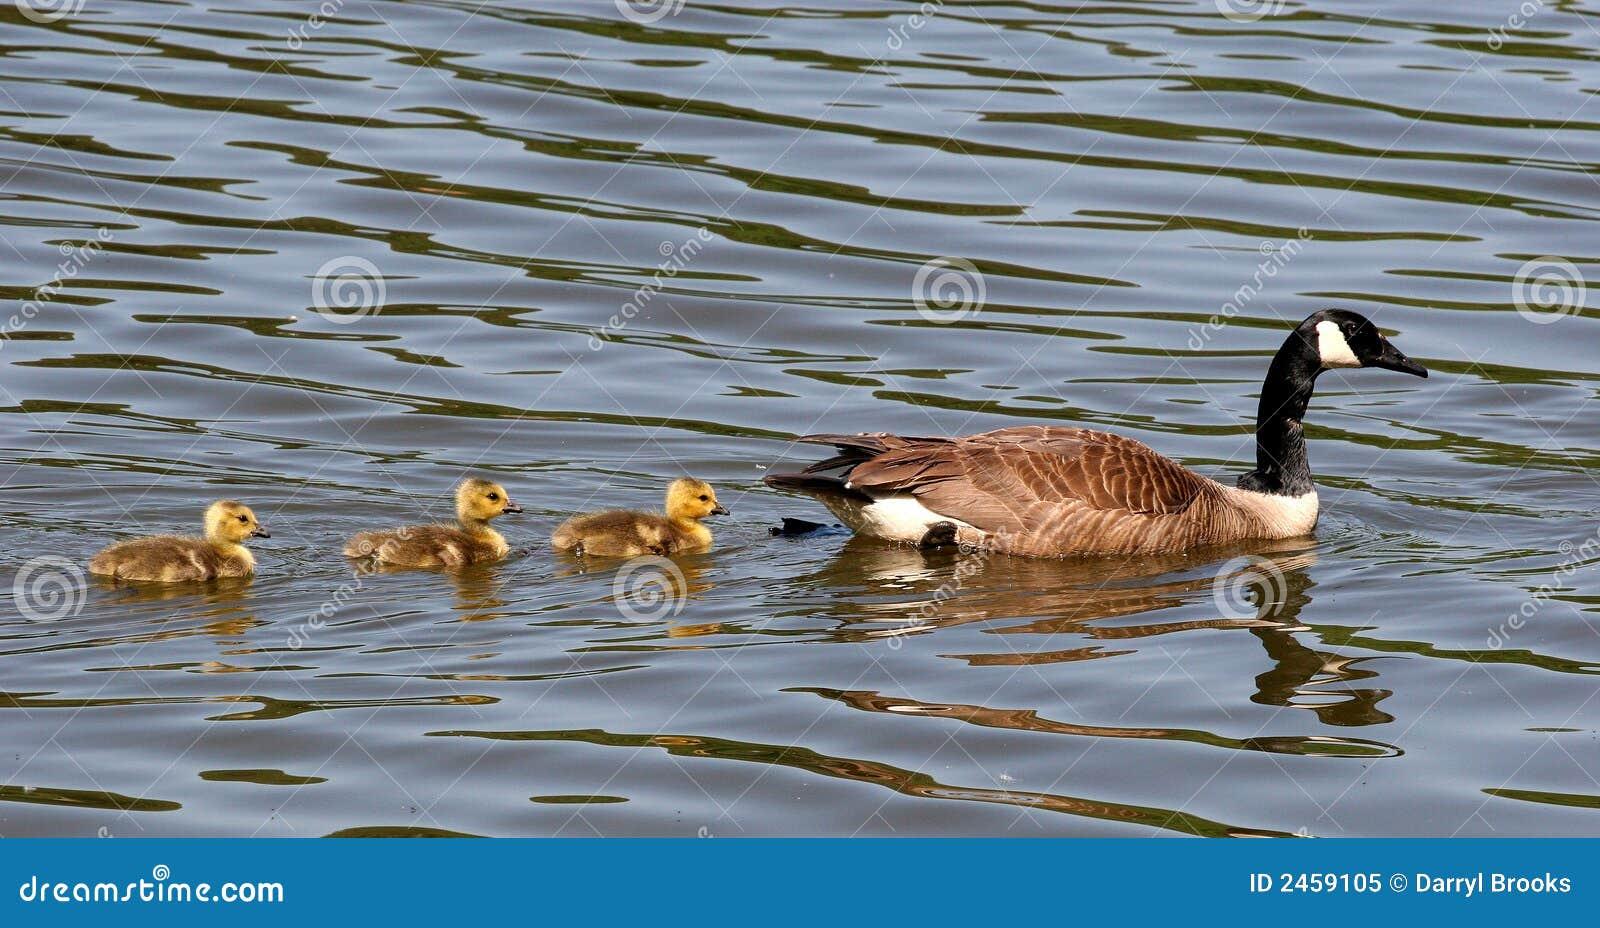 младенцы будут матерью 3